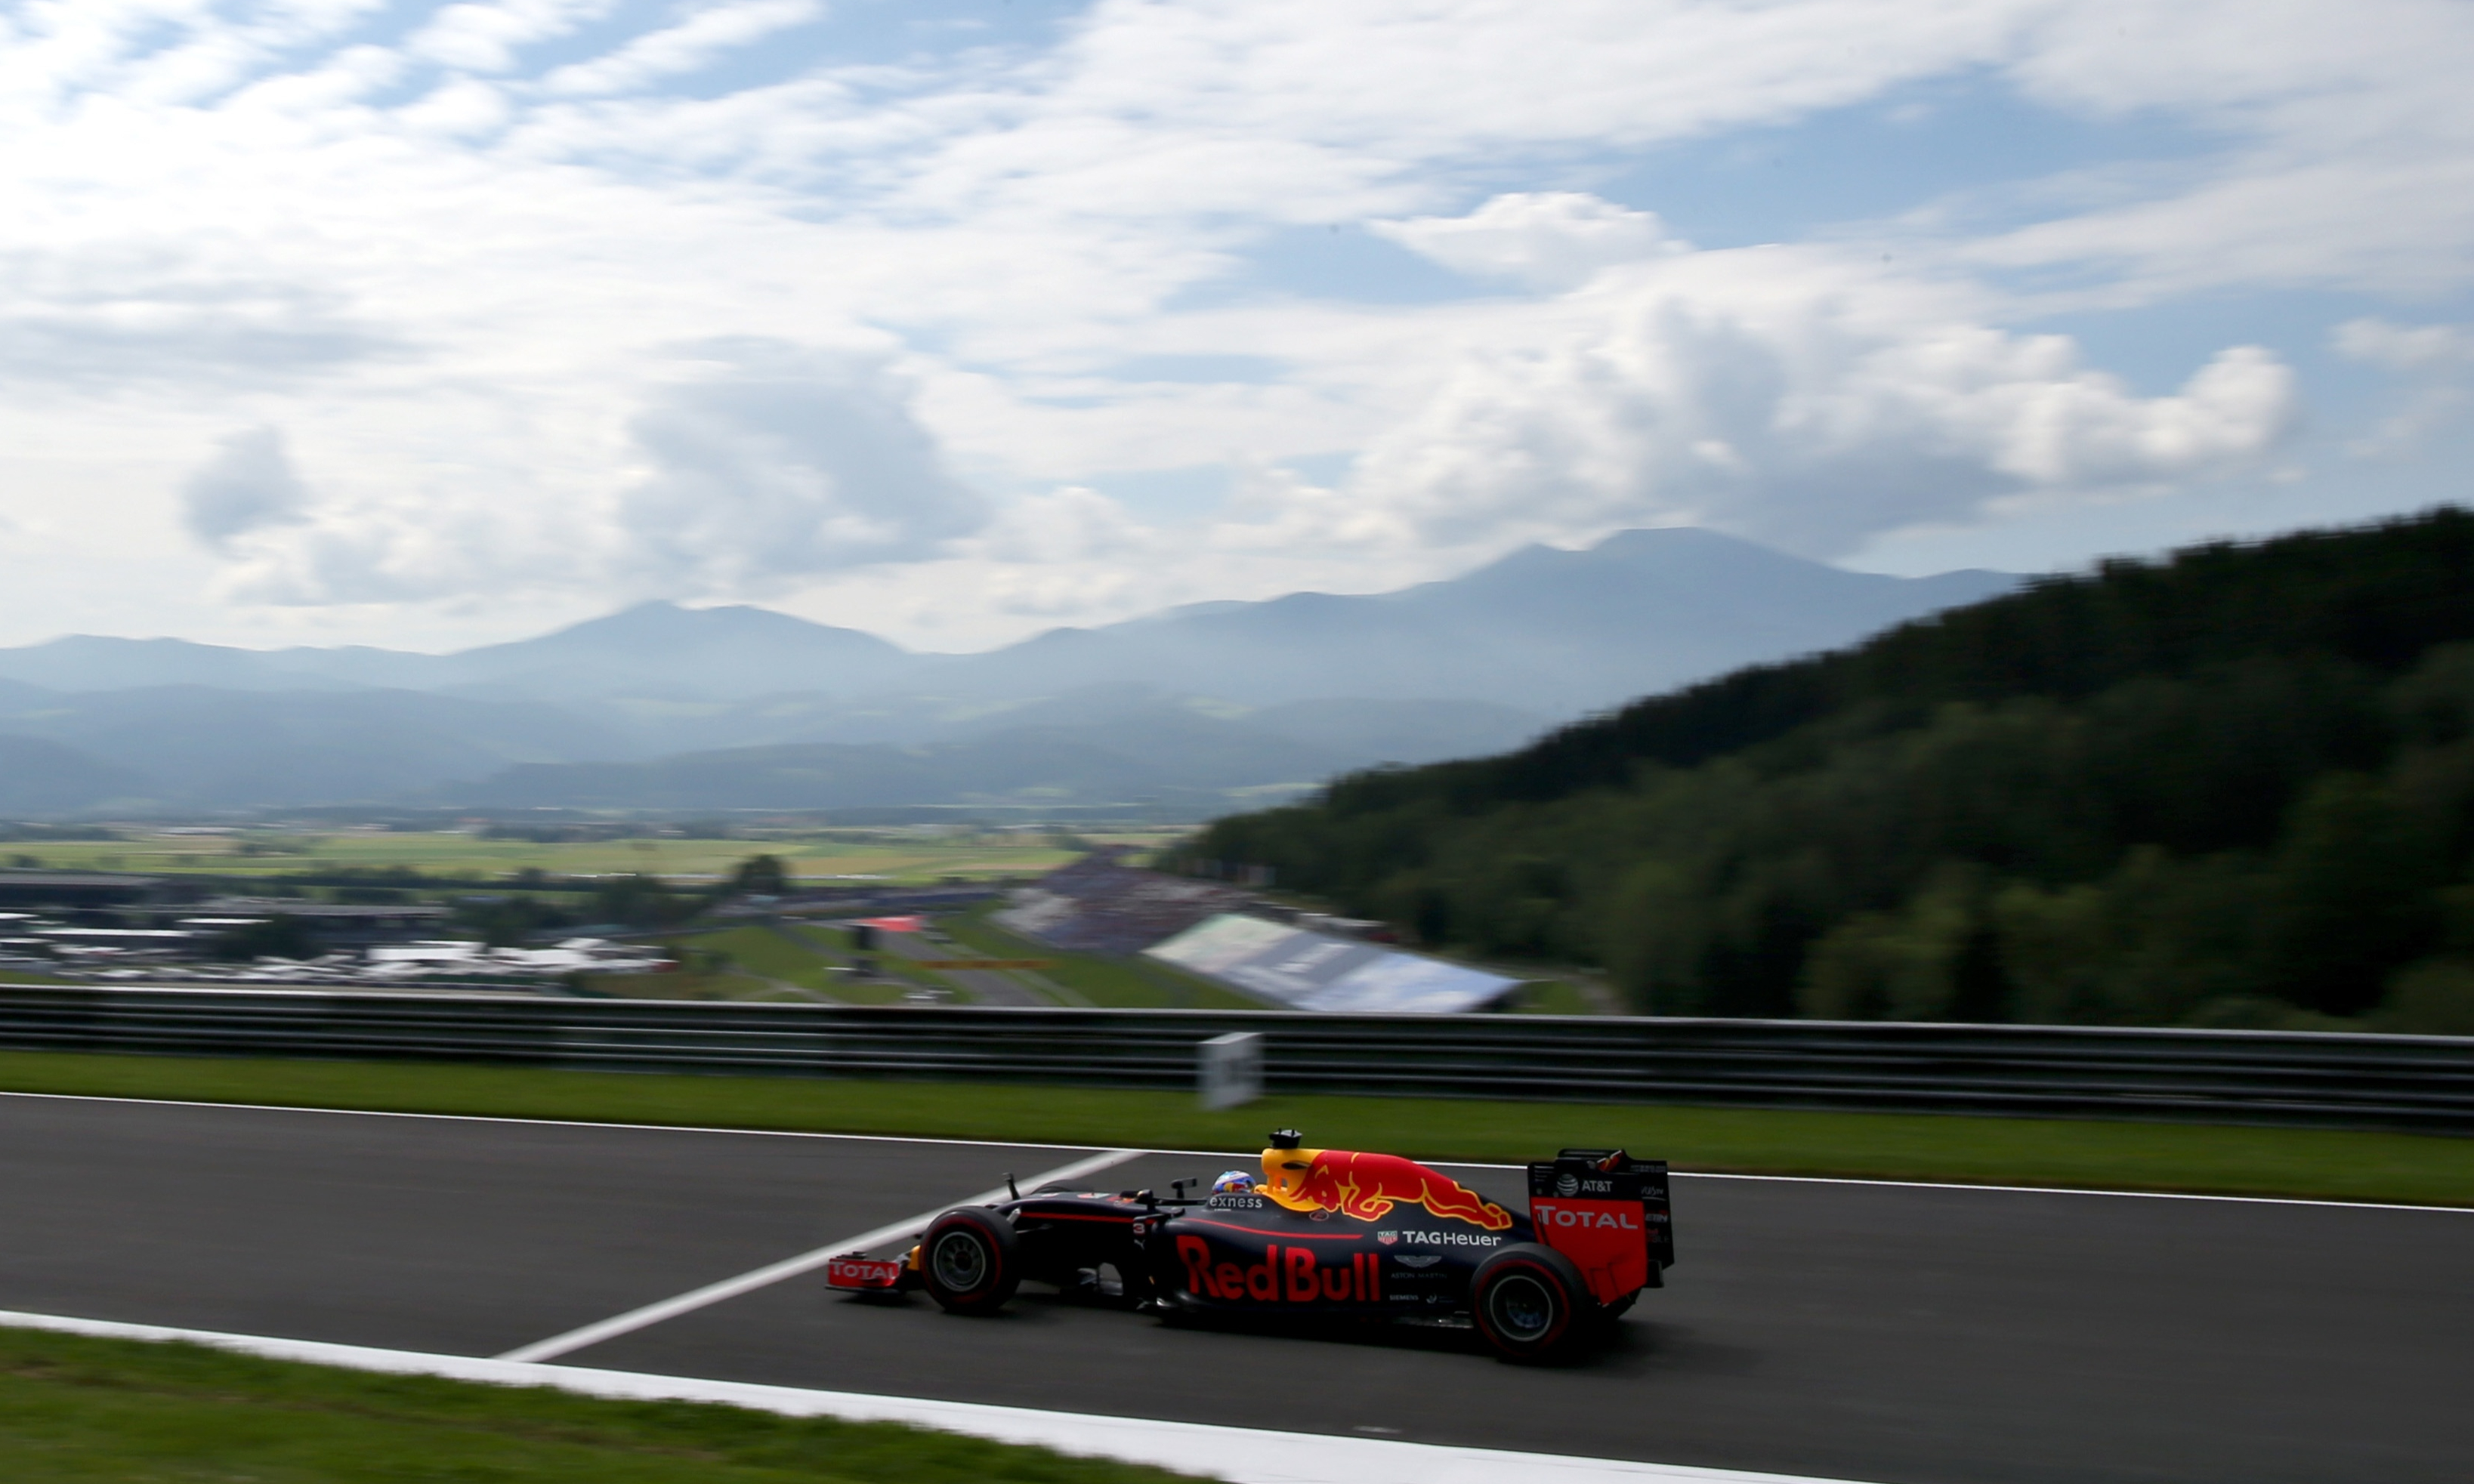 Lewis Hamilton takes pole at Austrian F1 Grand Prix amid the showers